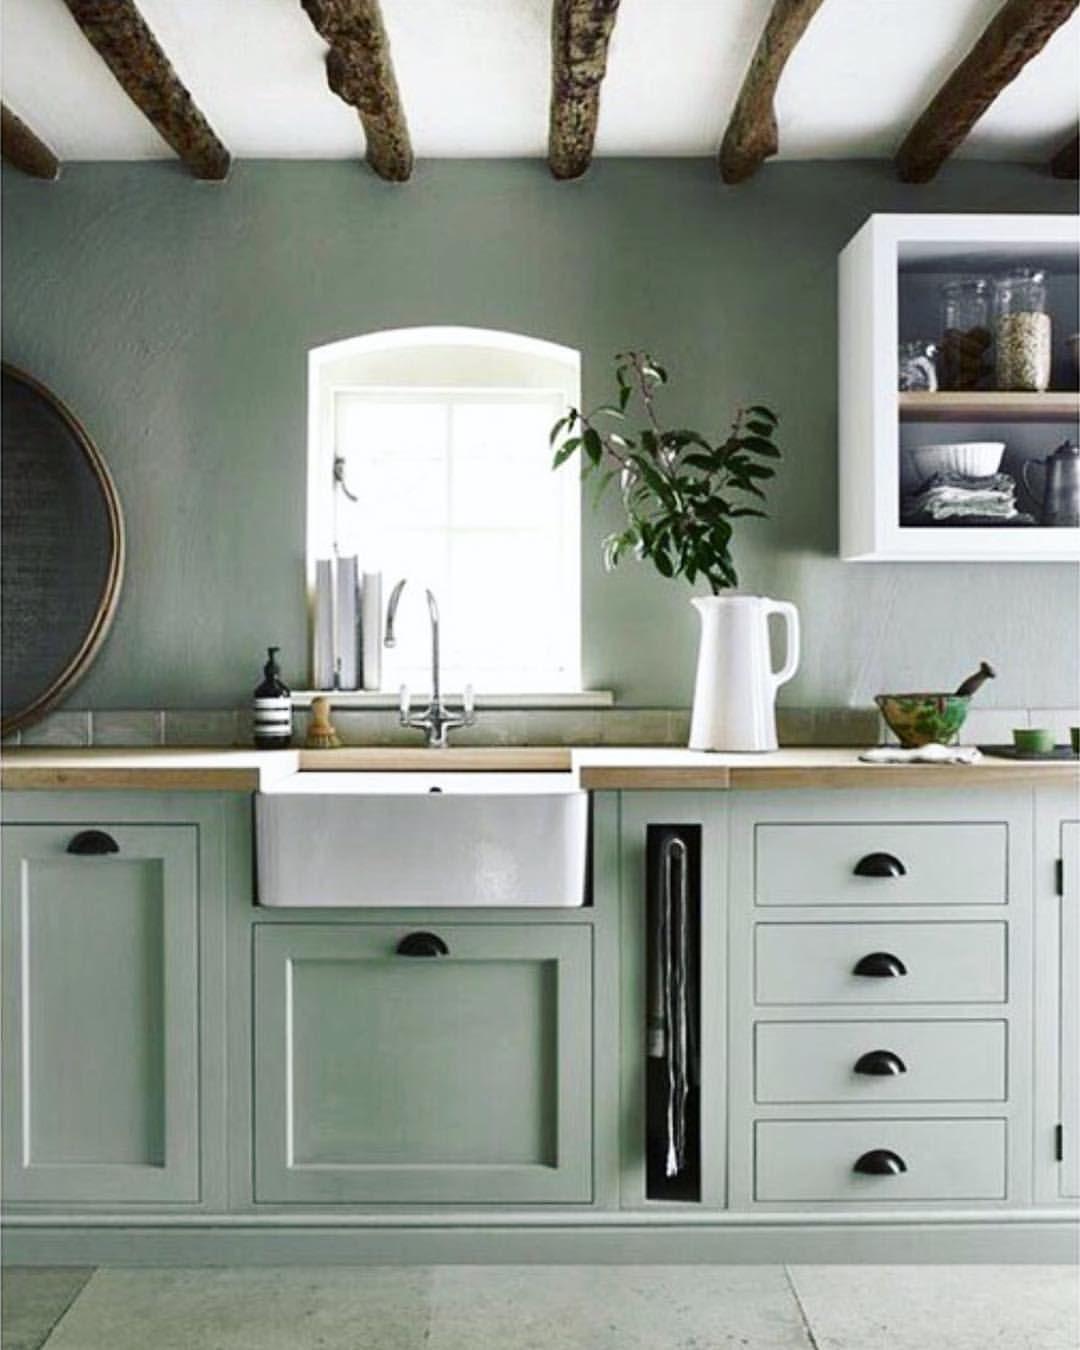 Imaginecozy Staging A Kitchen: 104 Me Gusta, 7 Comentarios